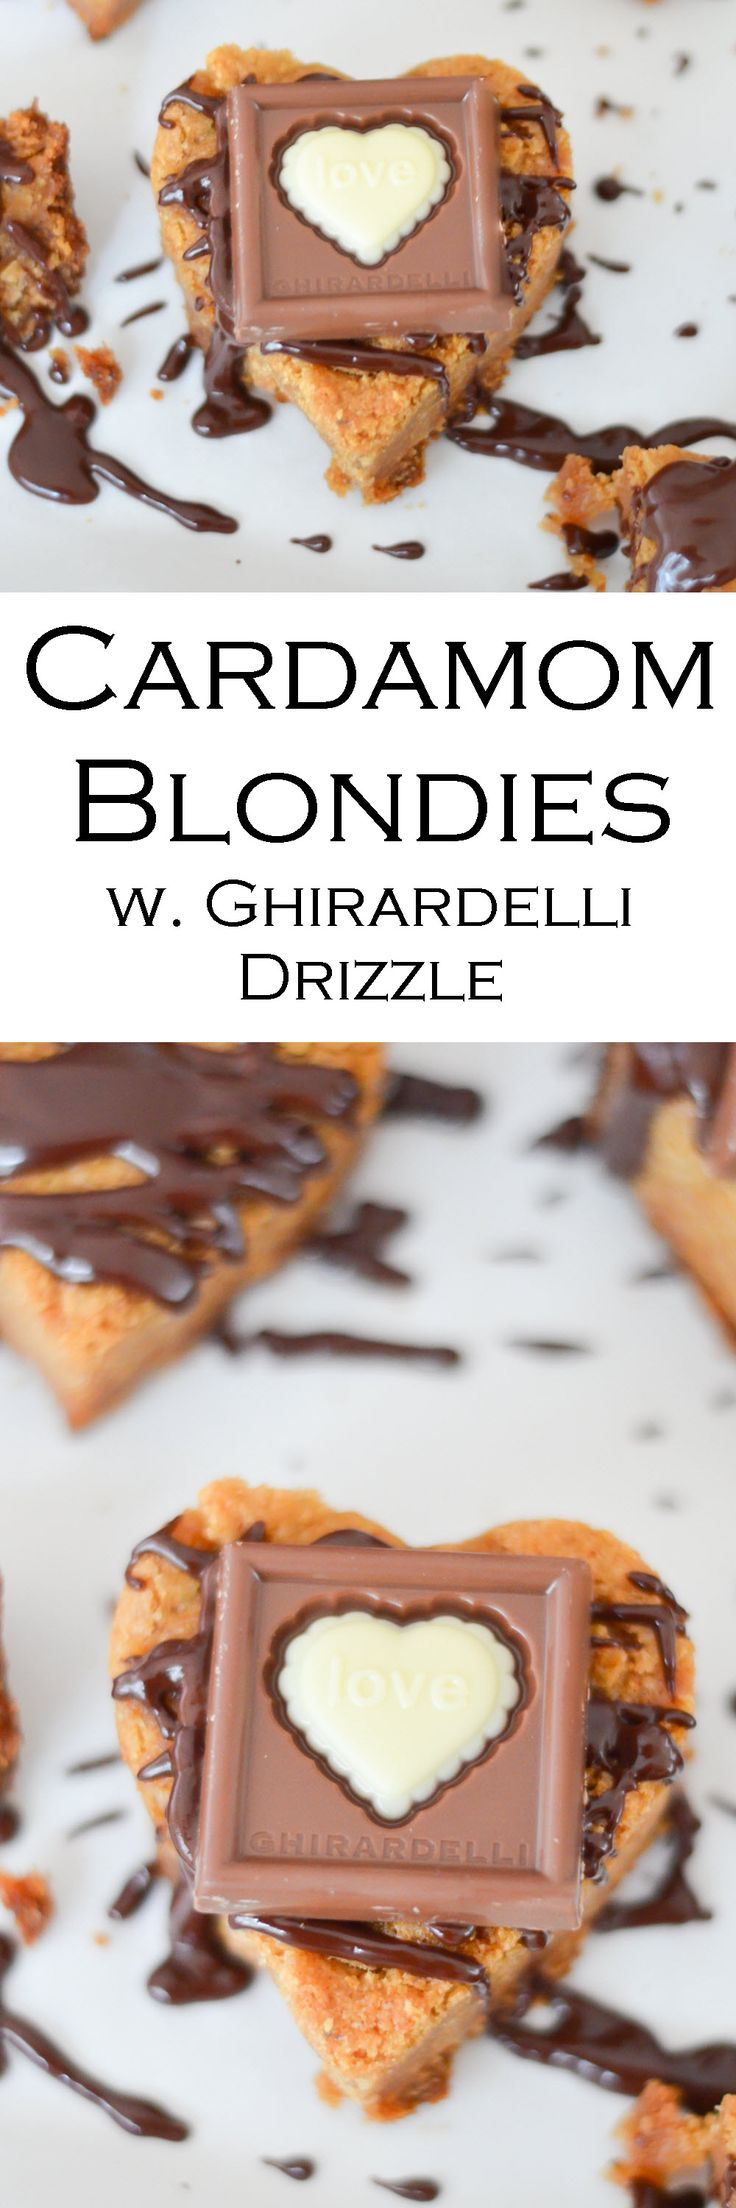 Cardamom Blondies w. Ghirardelli Chocolate Drizzle. Fun Valentine's Day Dessert for GrownUps